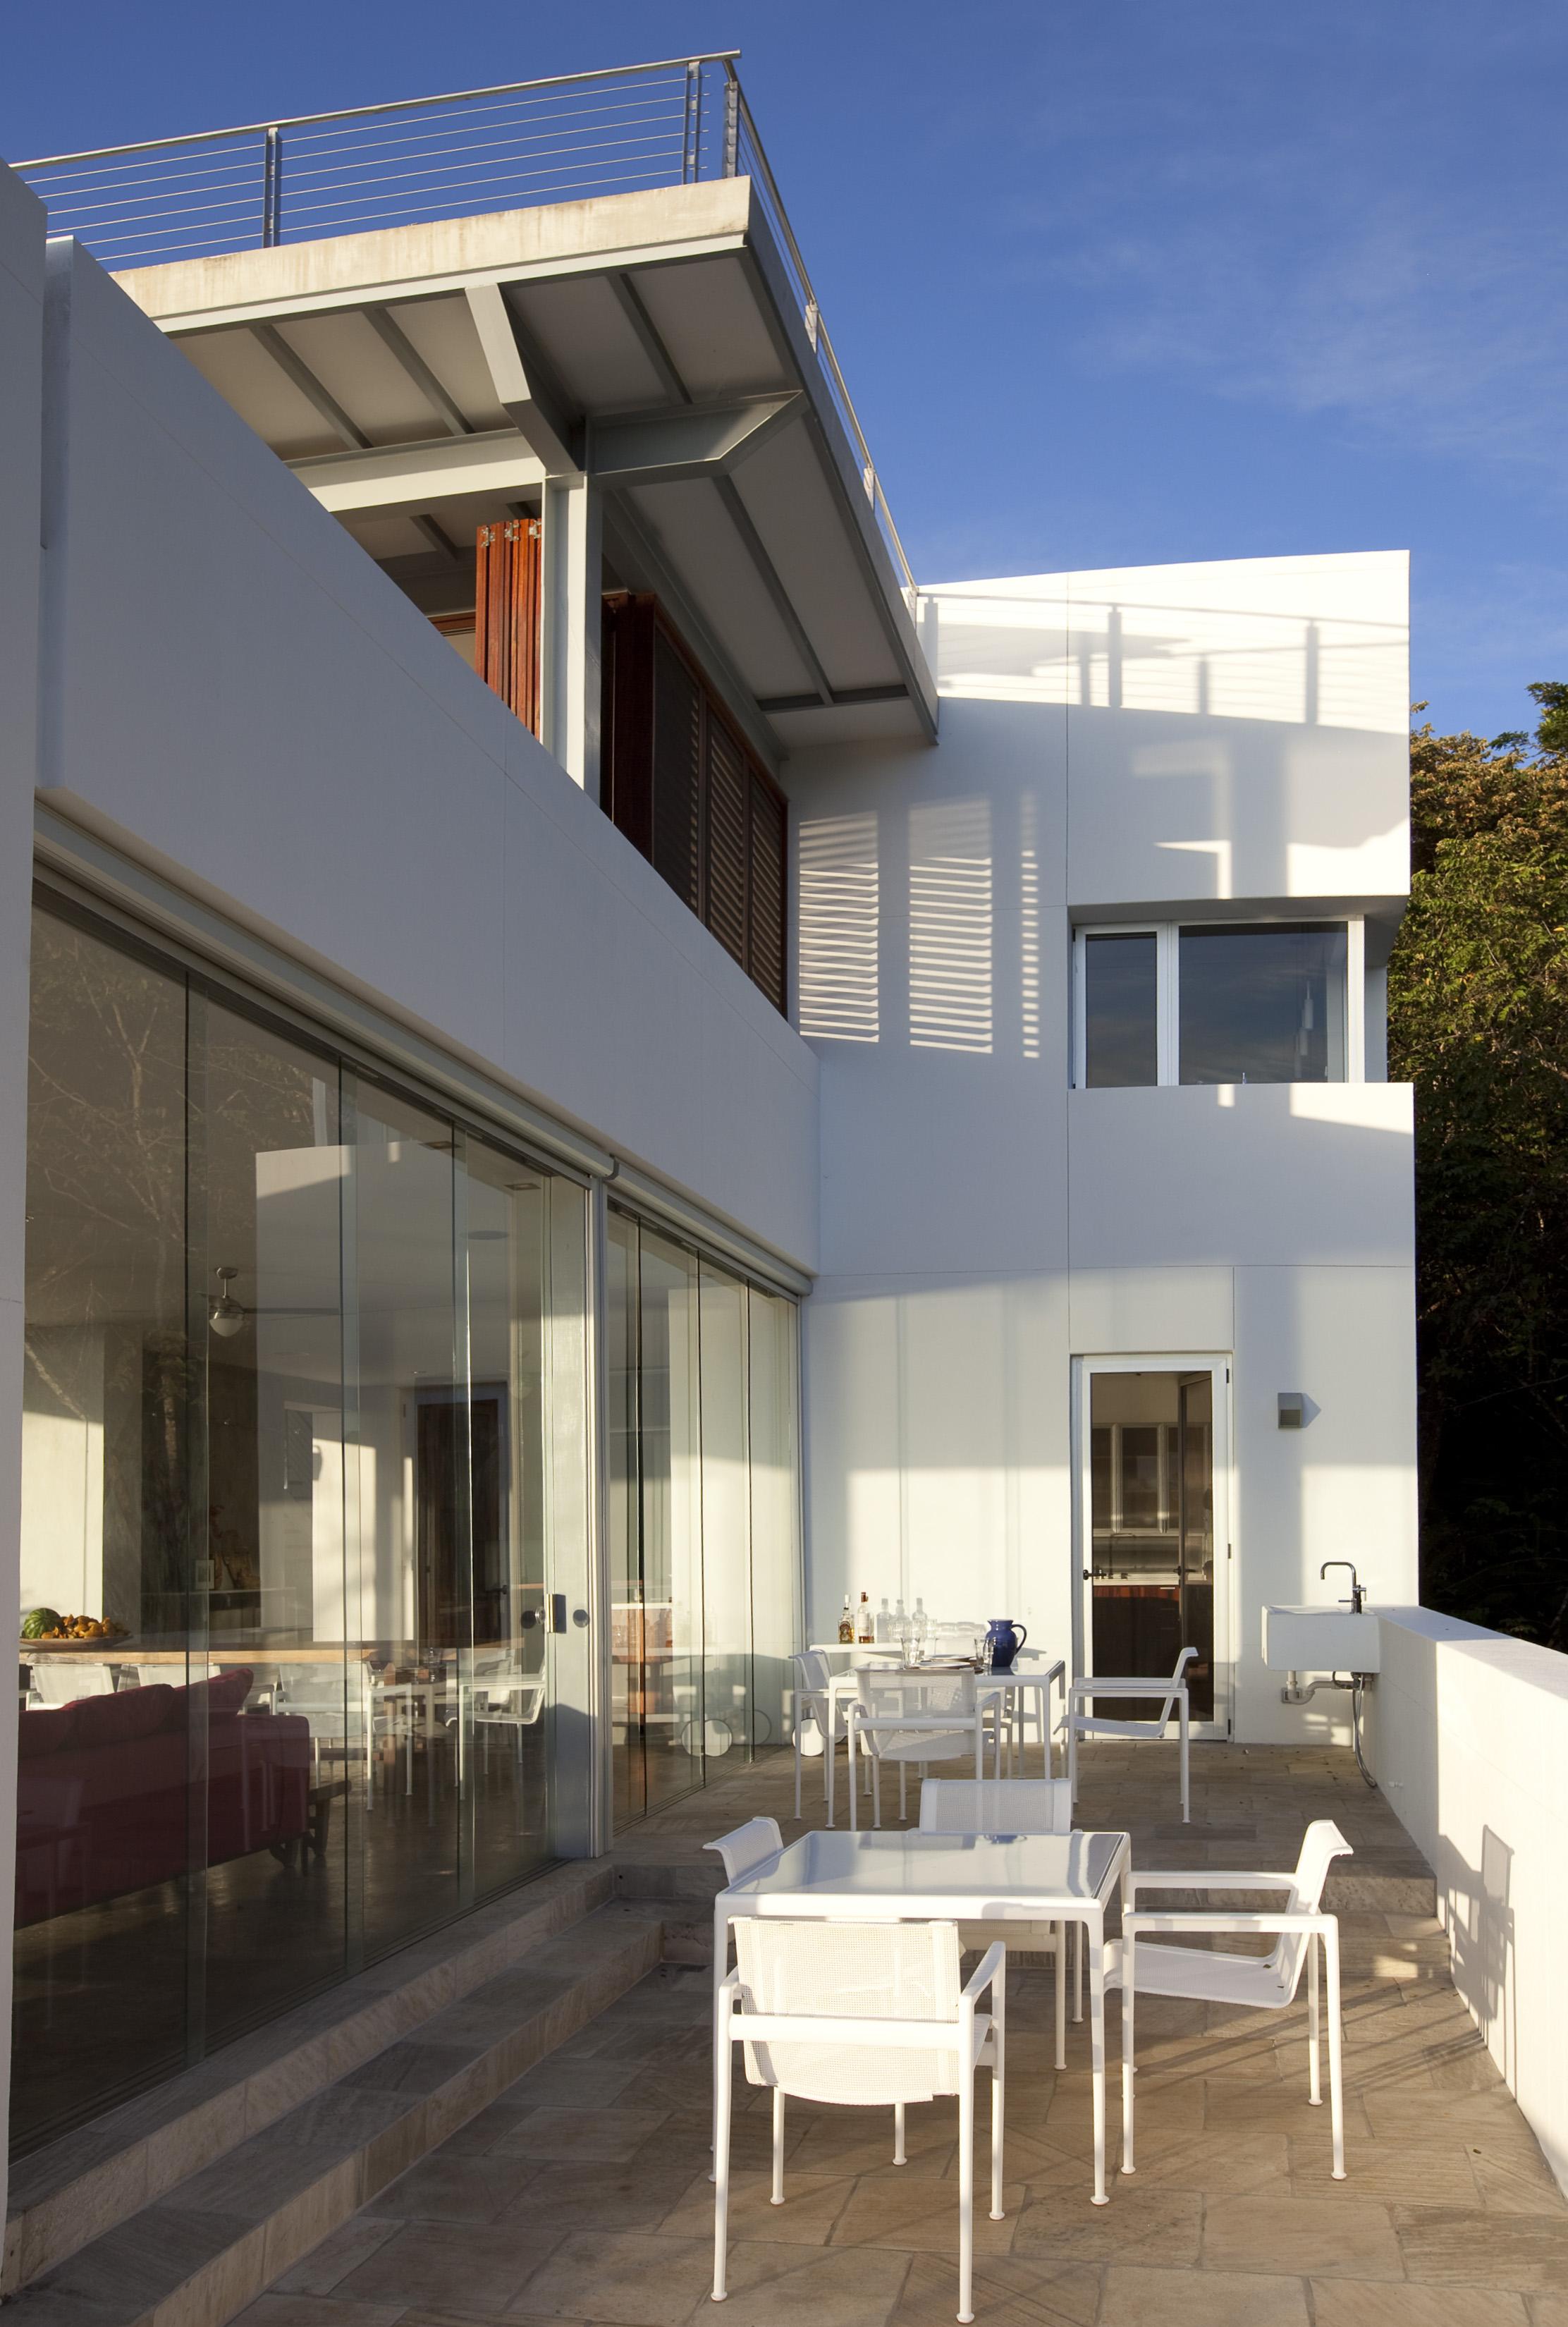 09 kitchen terrace